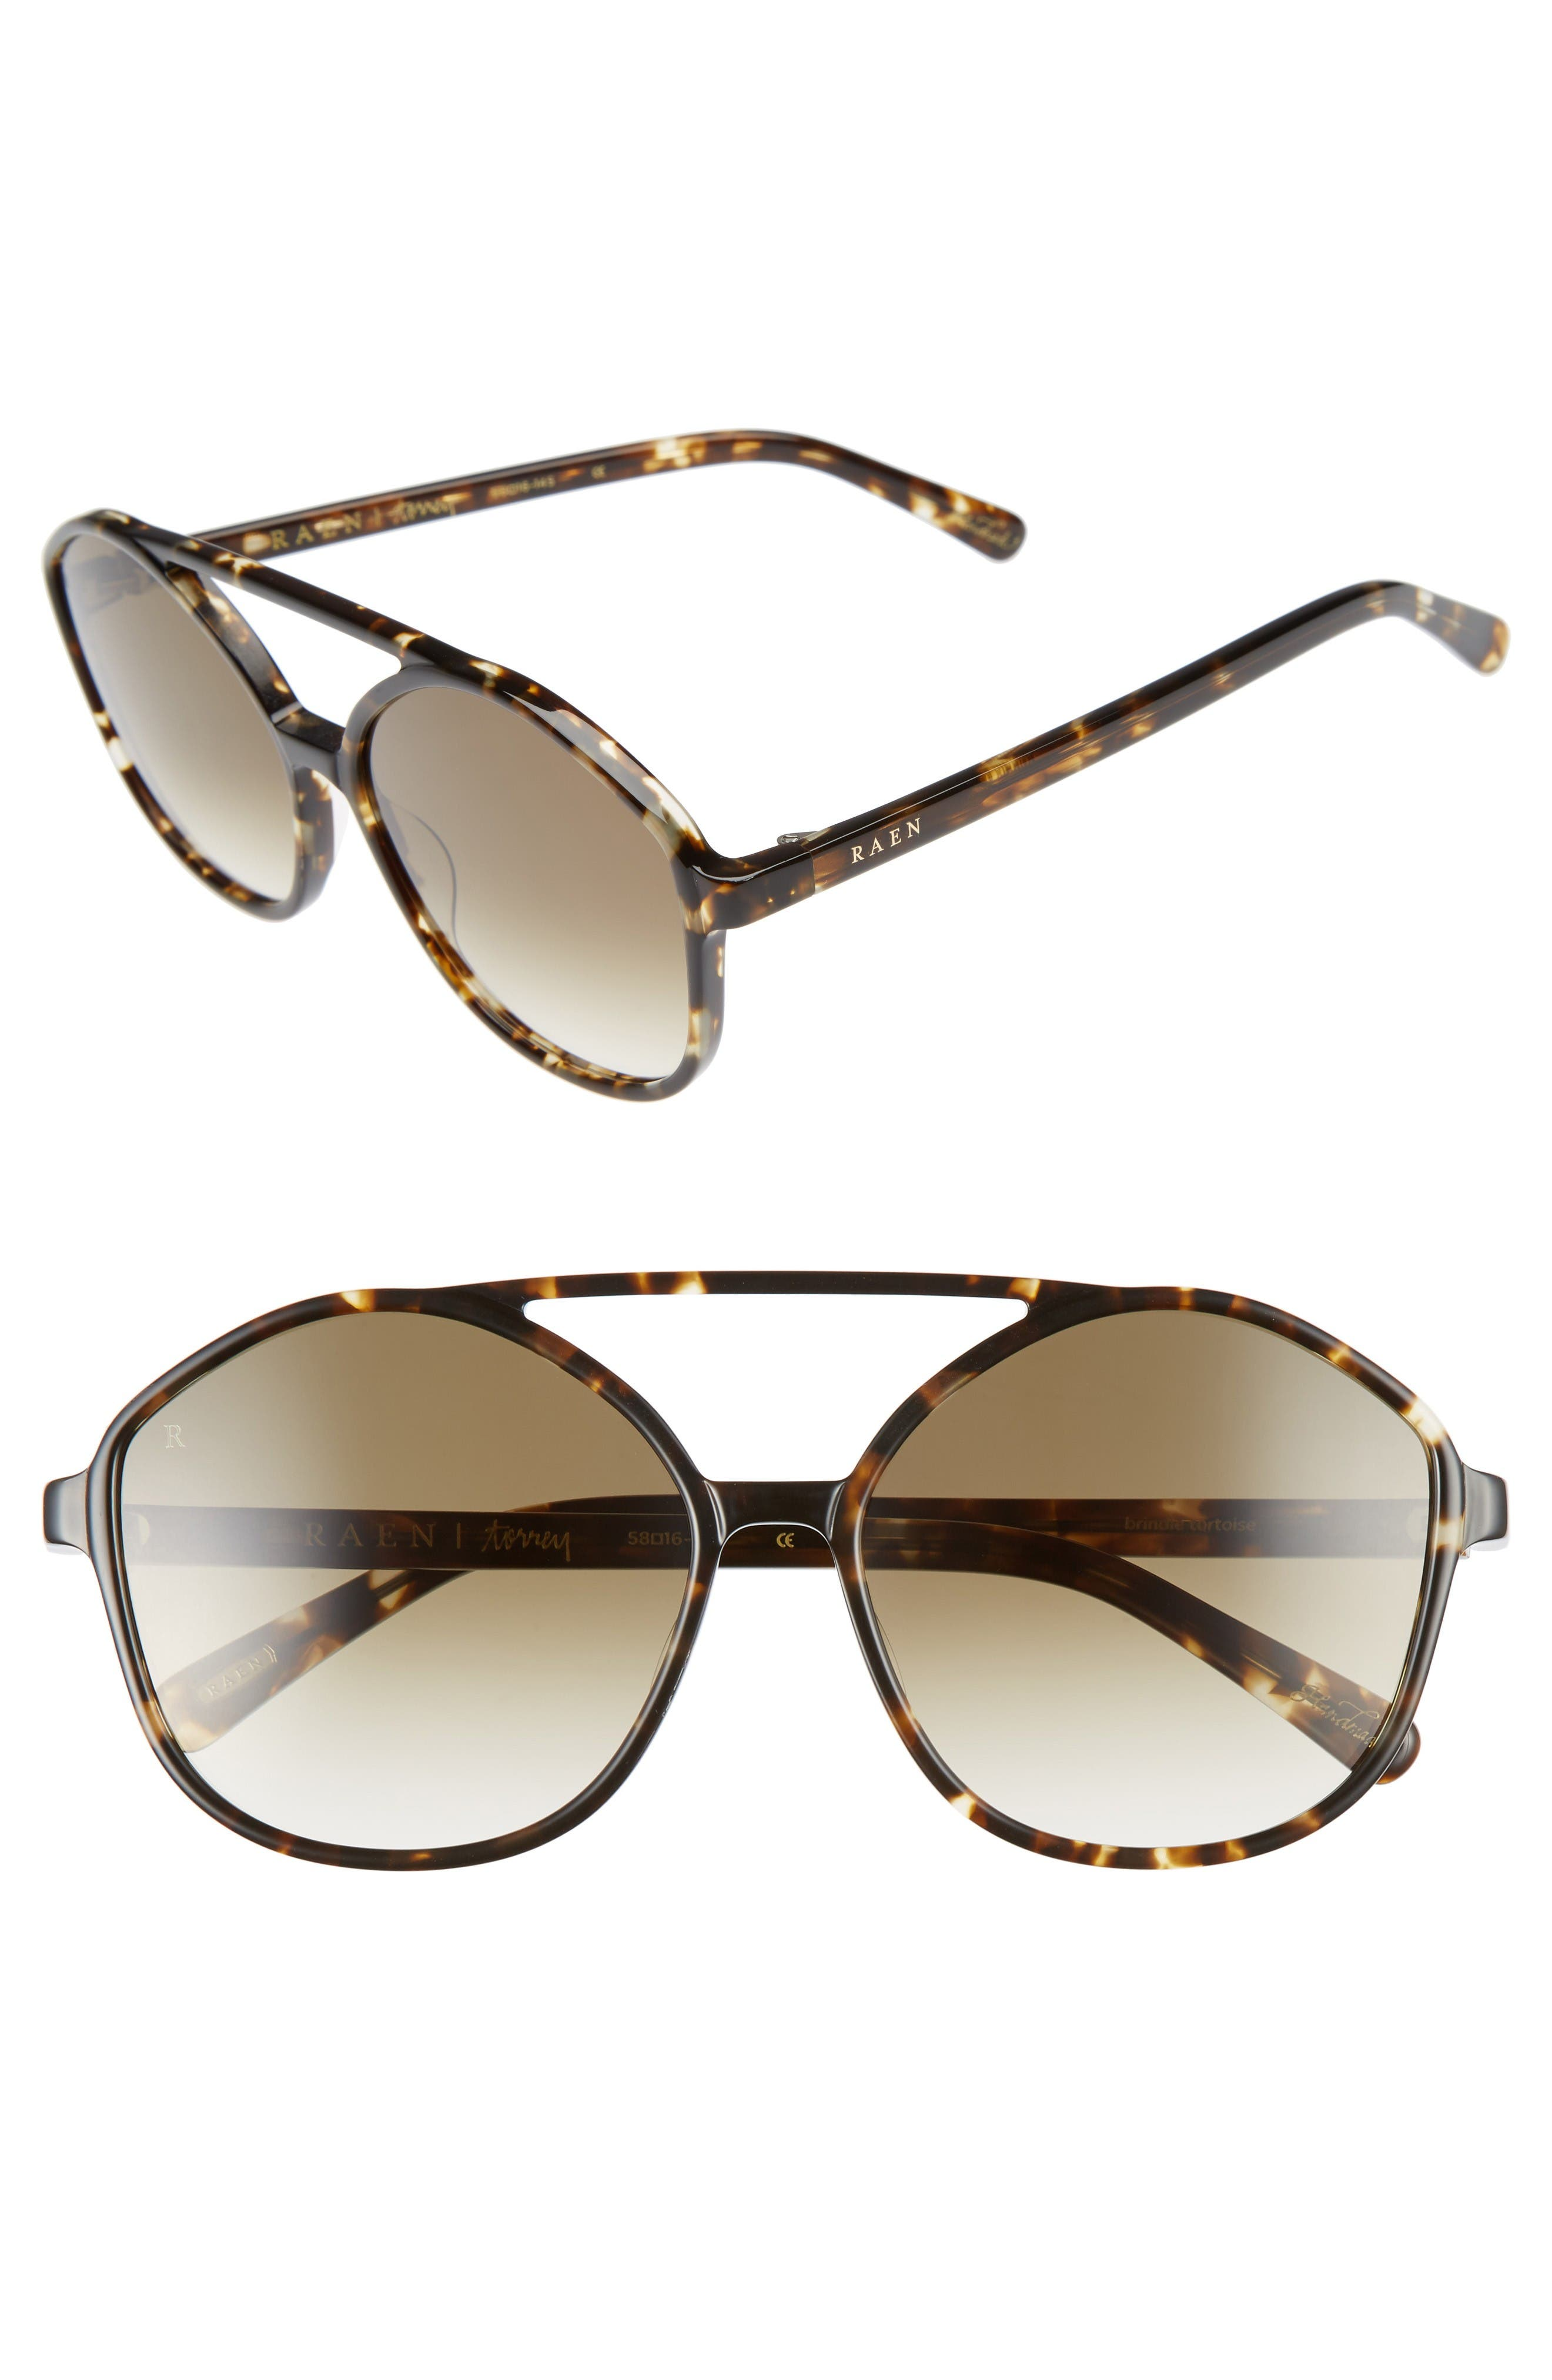 Torrey 58mm Aviator Sunglasses,                             Main thumbnail 1, color,                             Brindle Tortoise